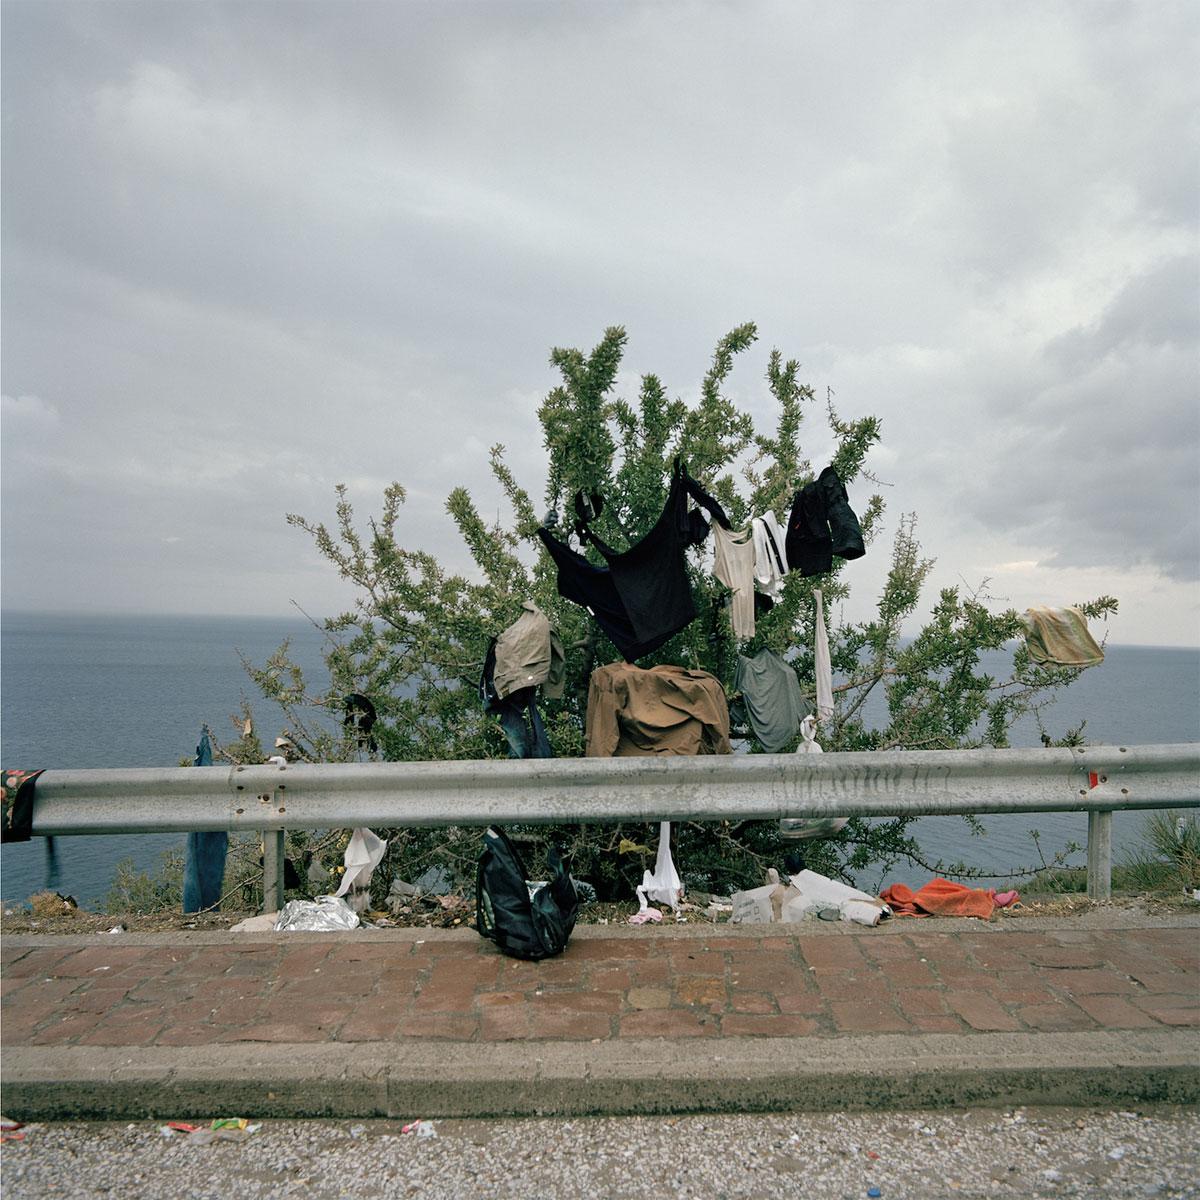 Дерево жизни, © Деметрис Койлалус / Demetris Koilalous (Греция), Фотоконкурс Renaissance Photography Prize